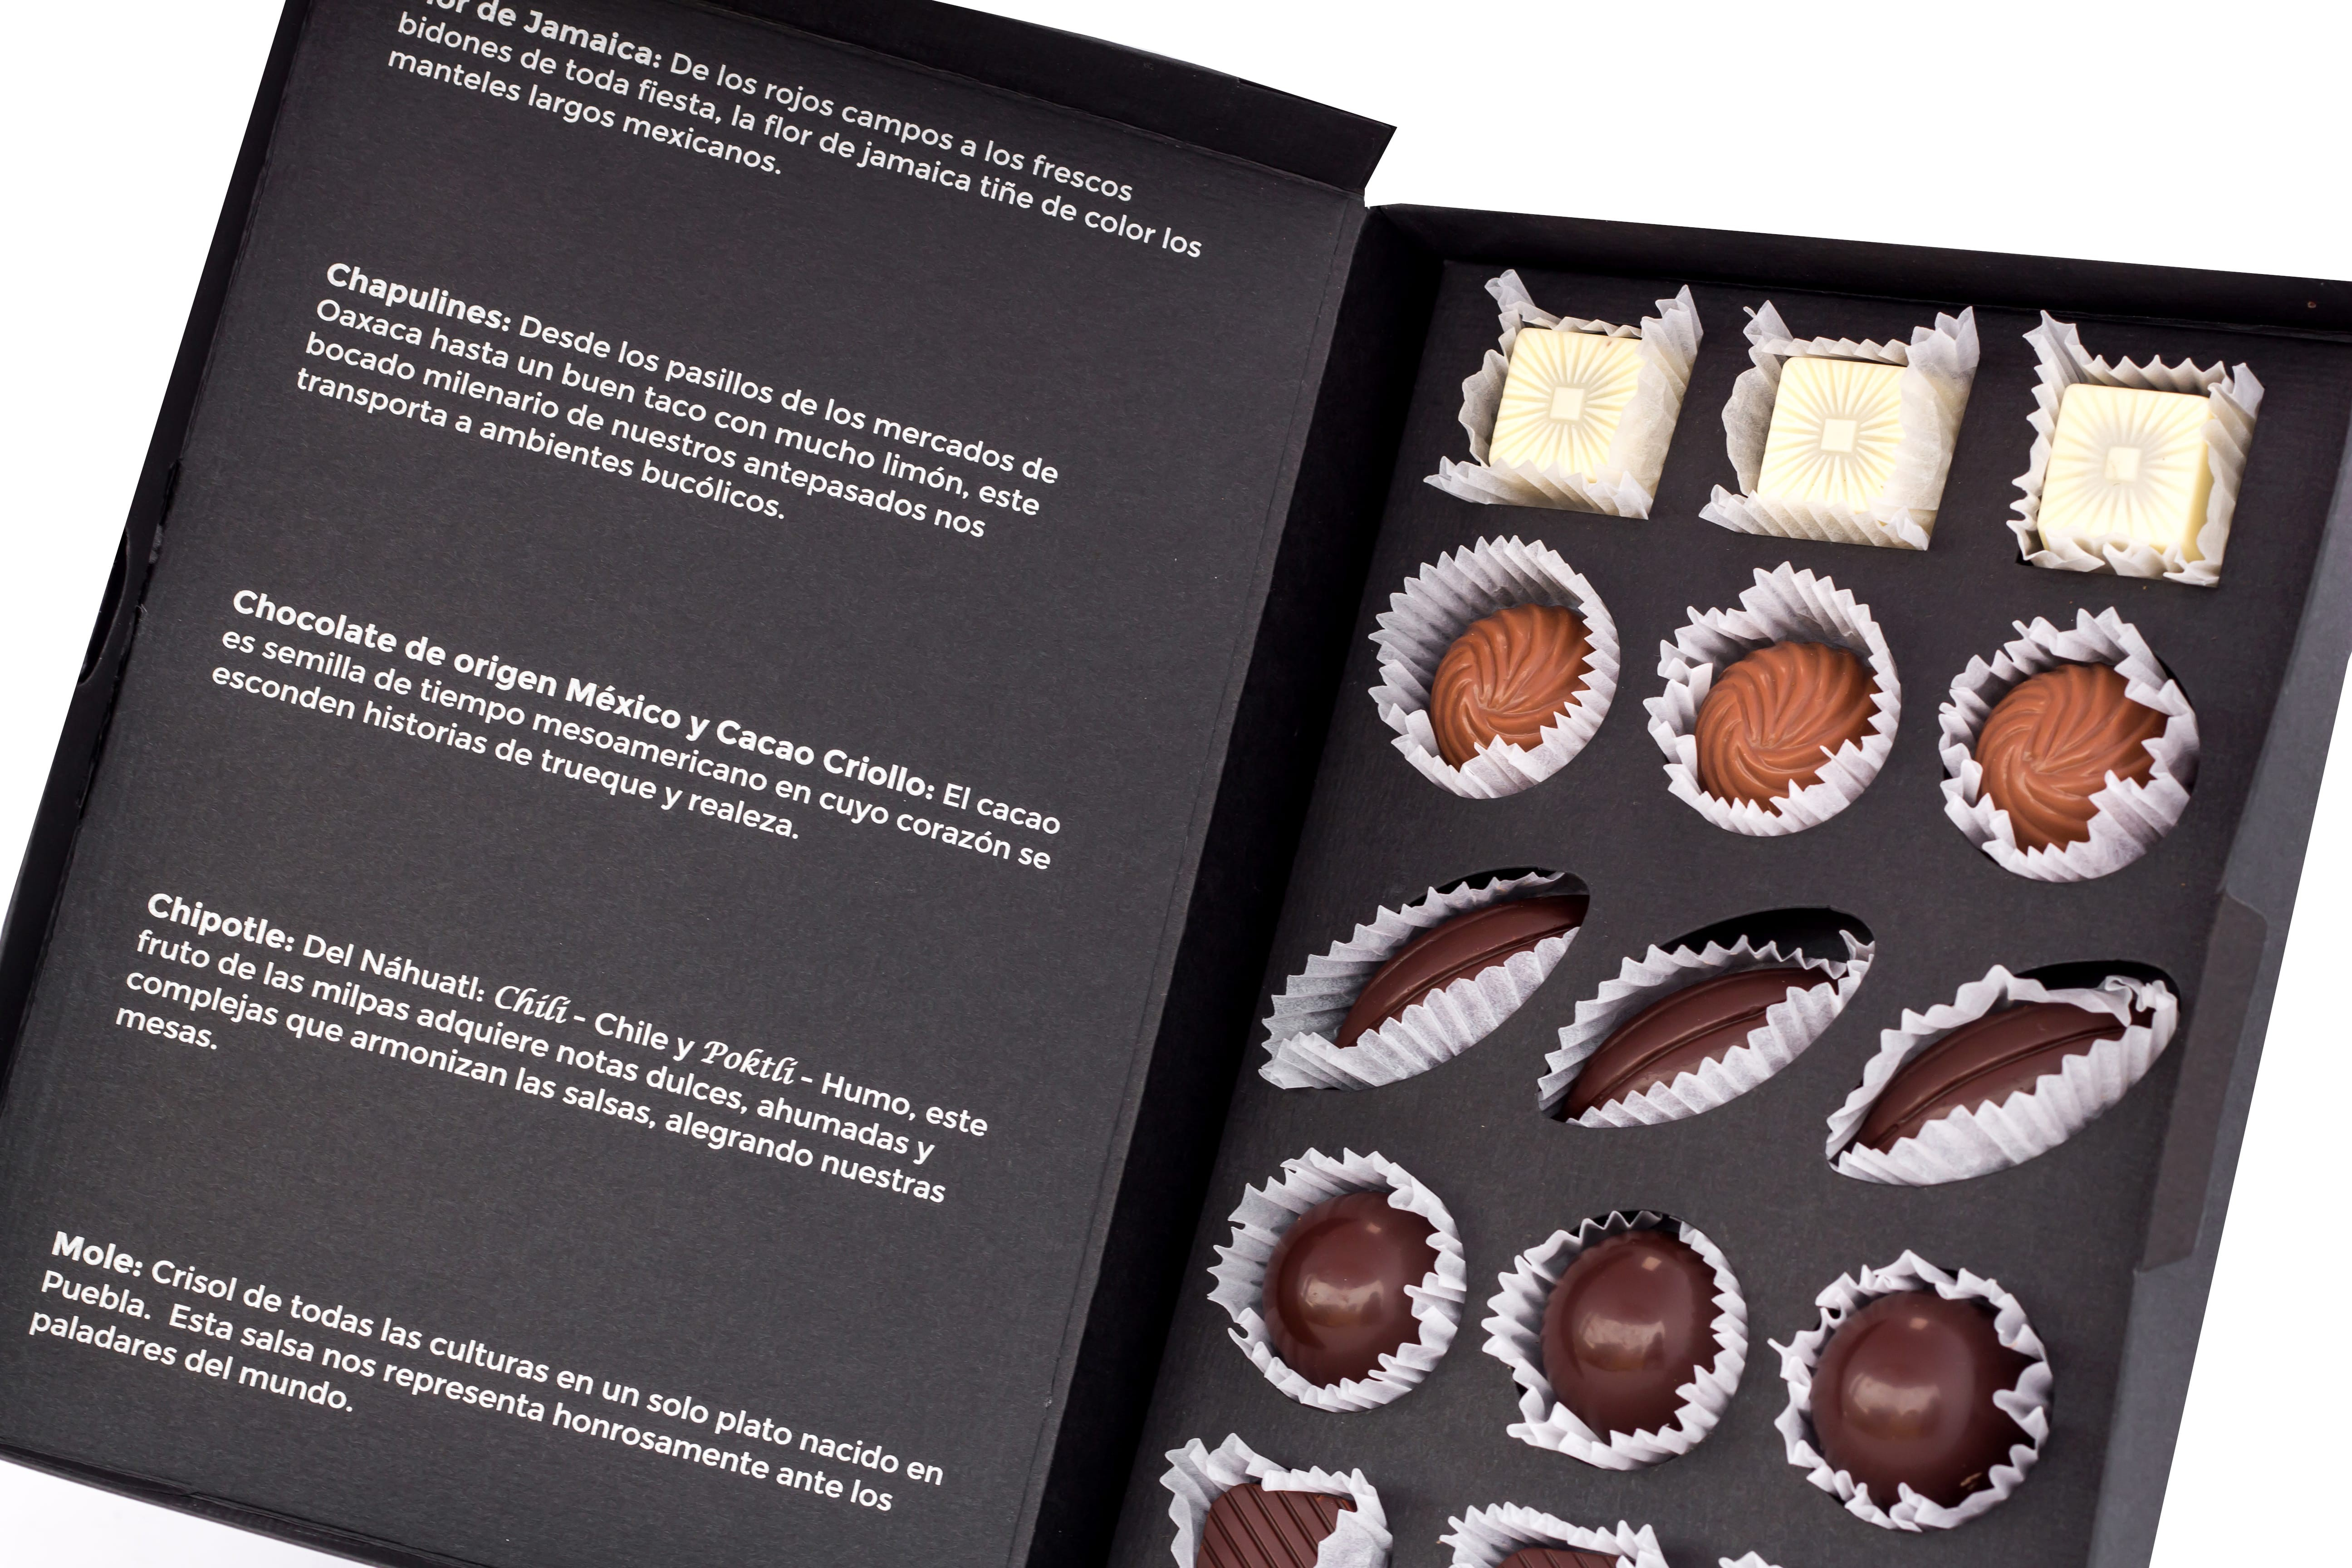 Beautifully presented chocolates   Courtesy of Le Caméléon